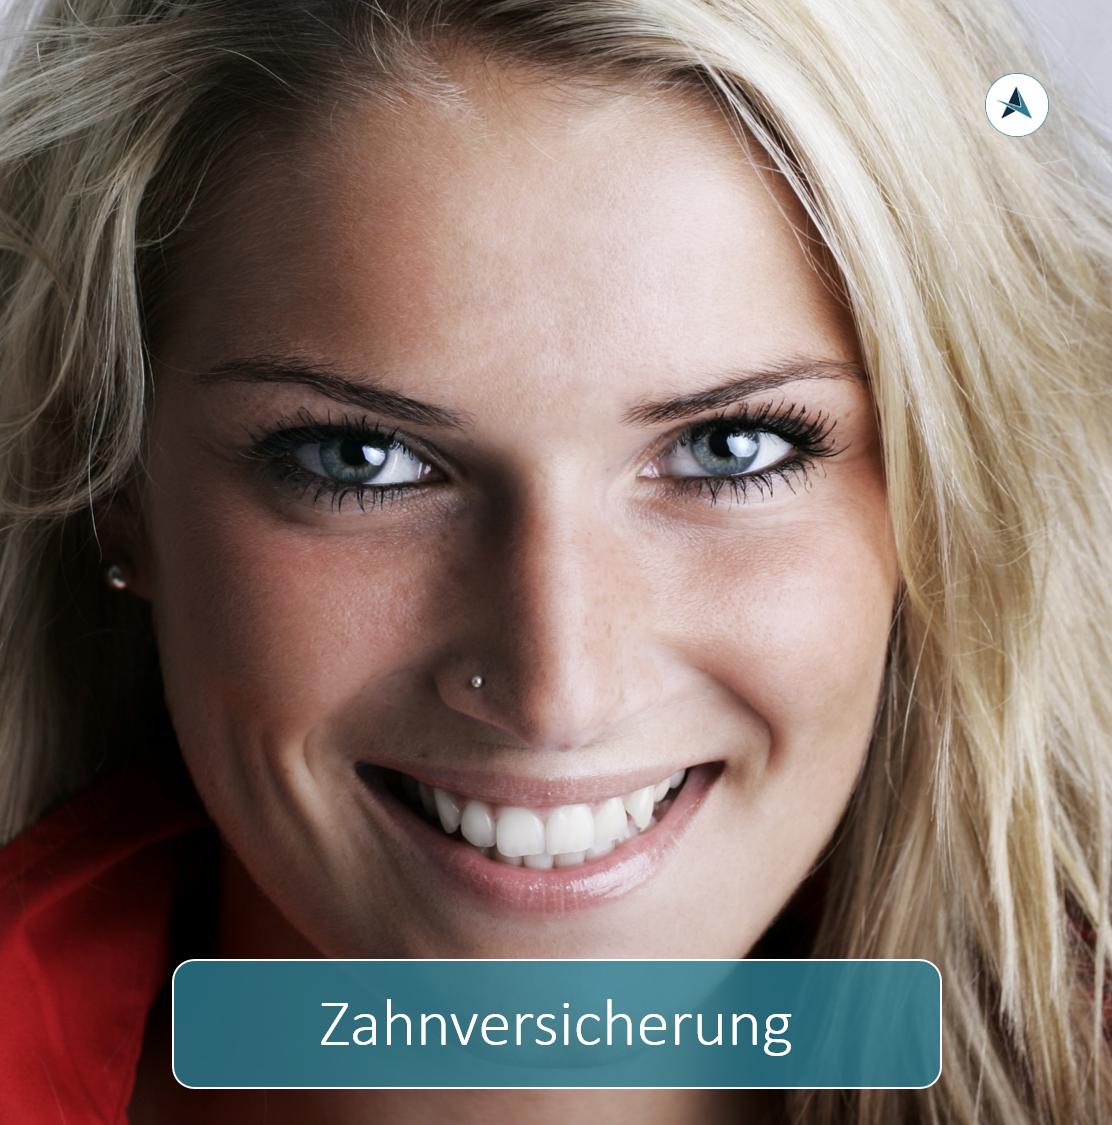 Versicherungsmakler-Berlin-Lichtenberg-Zahnversicherung-André-Böttcher-Zahnzusatzversicherung